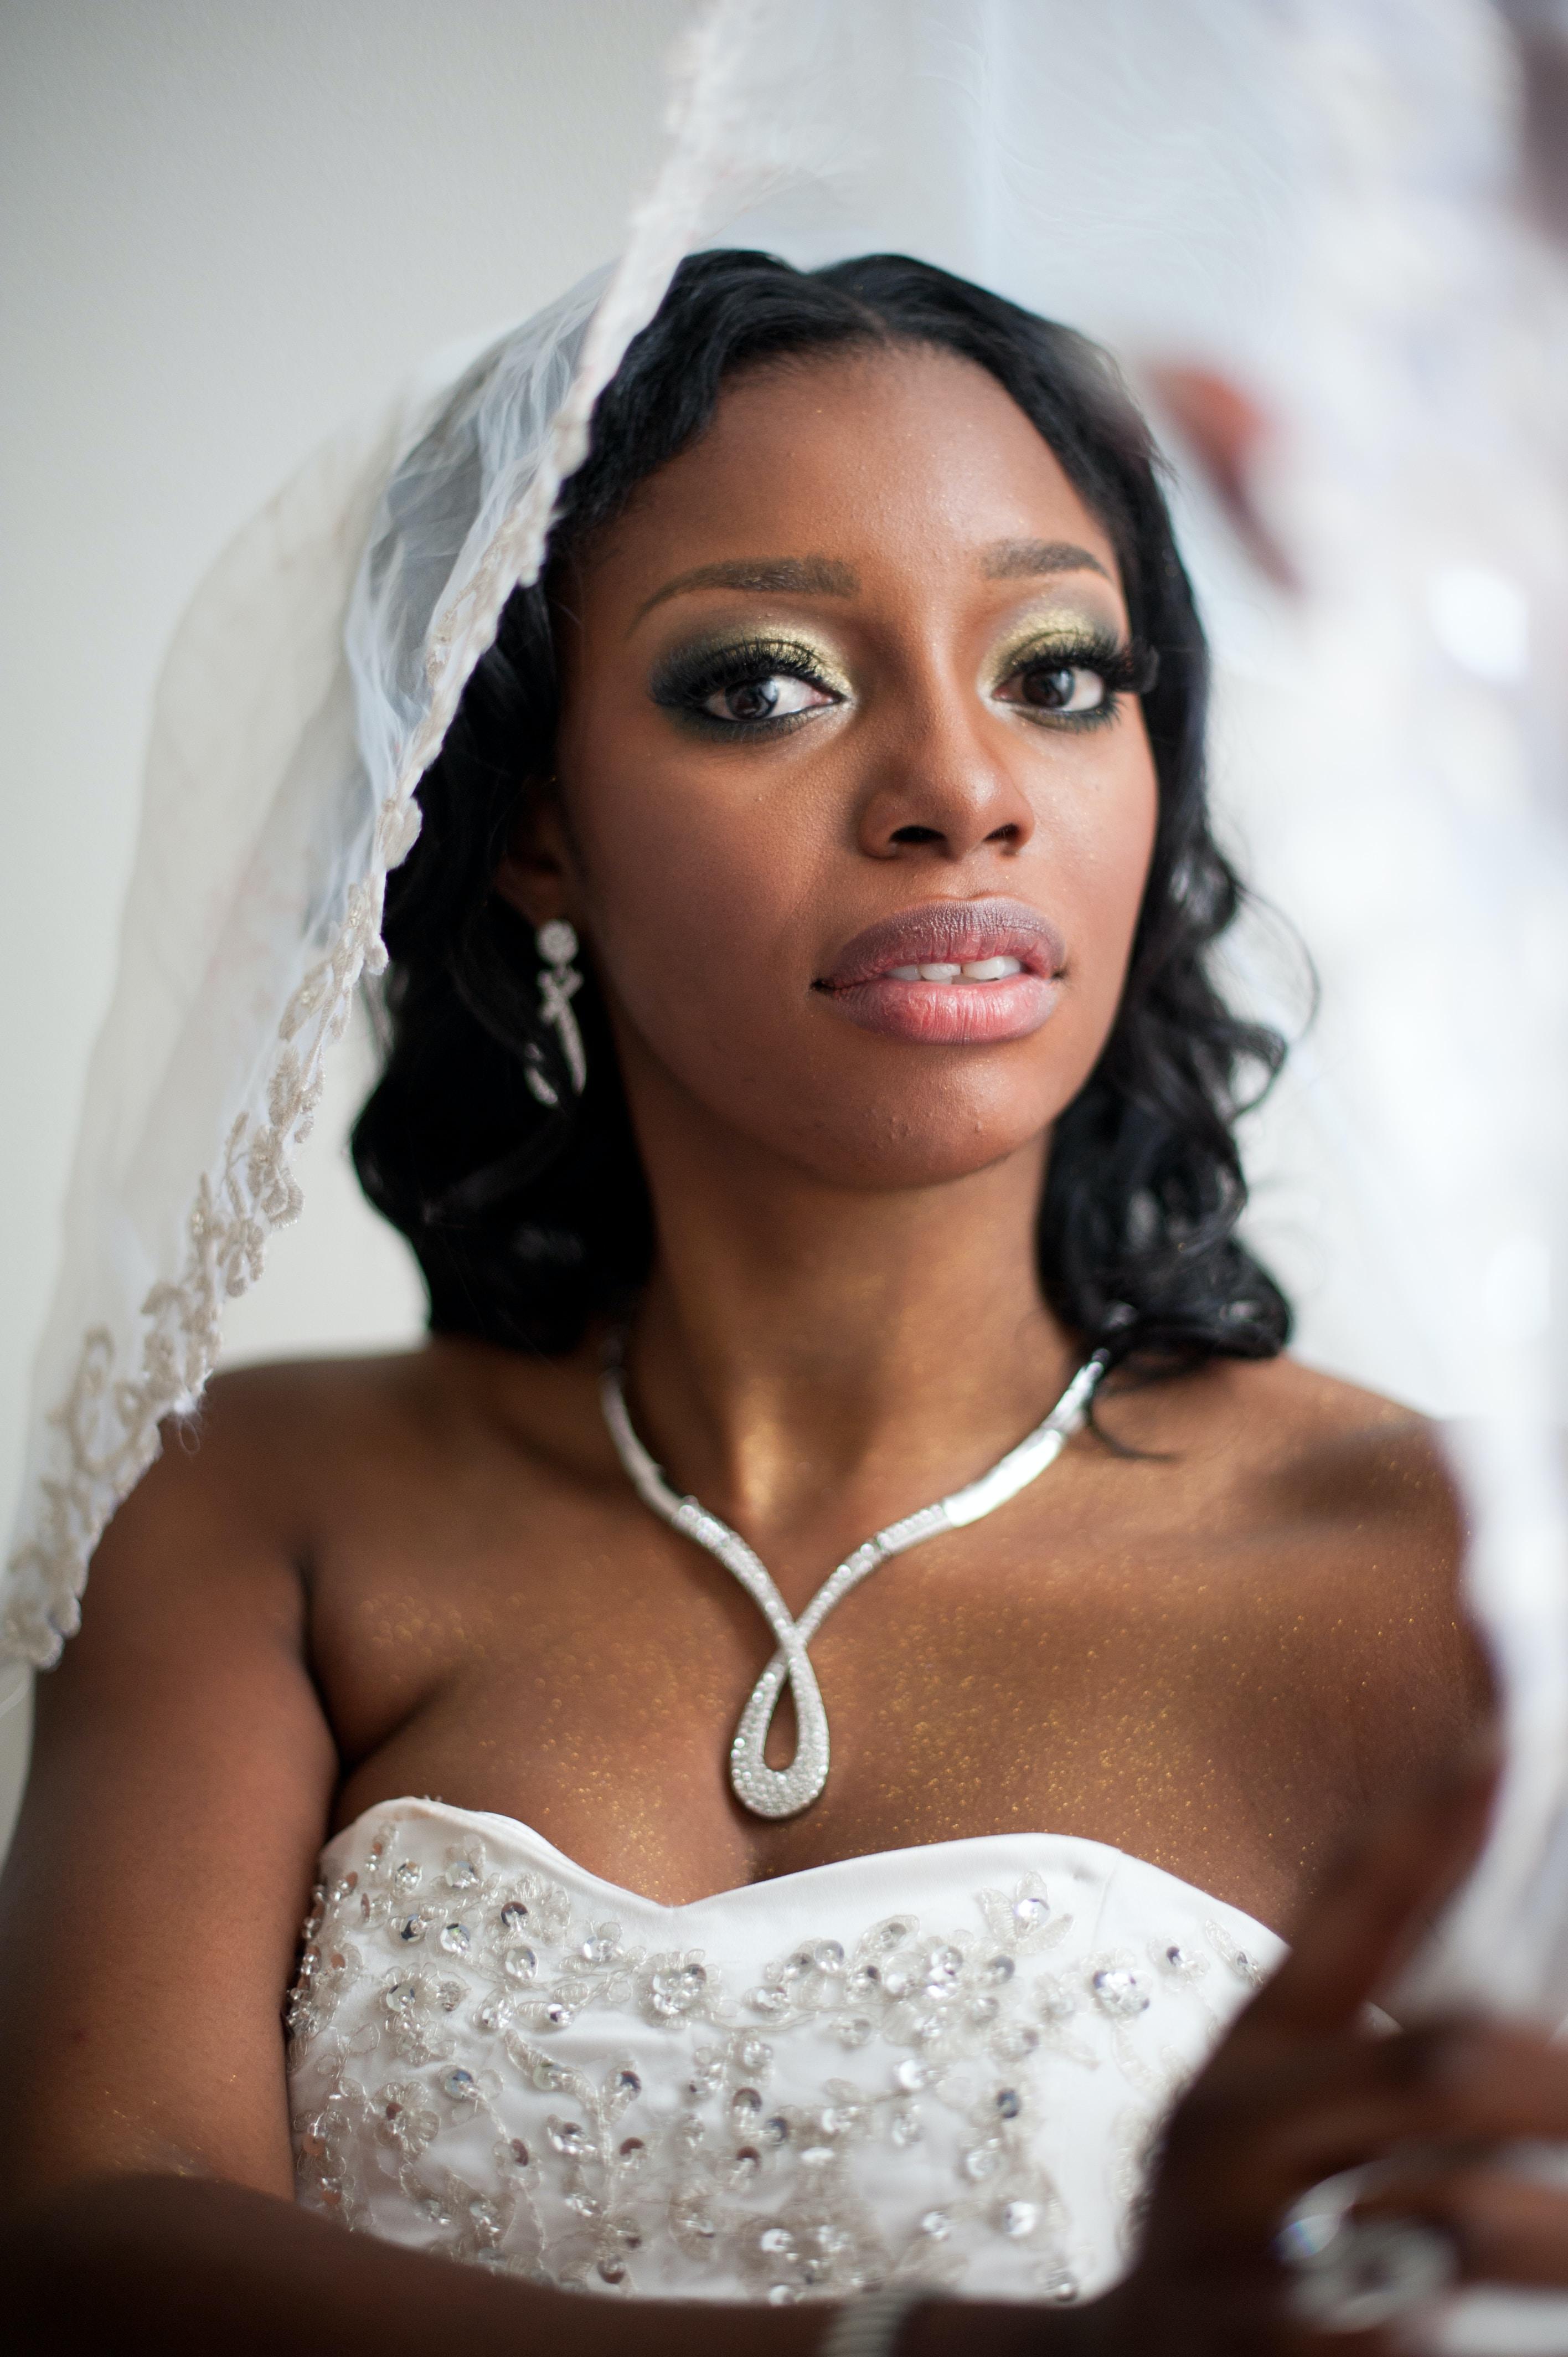 Worried bride wearing a wedding dress and veil